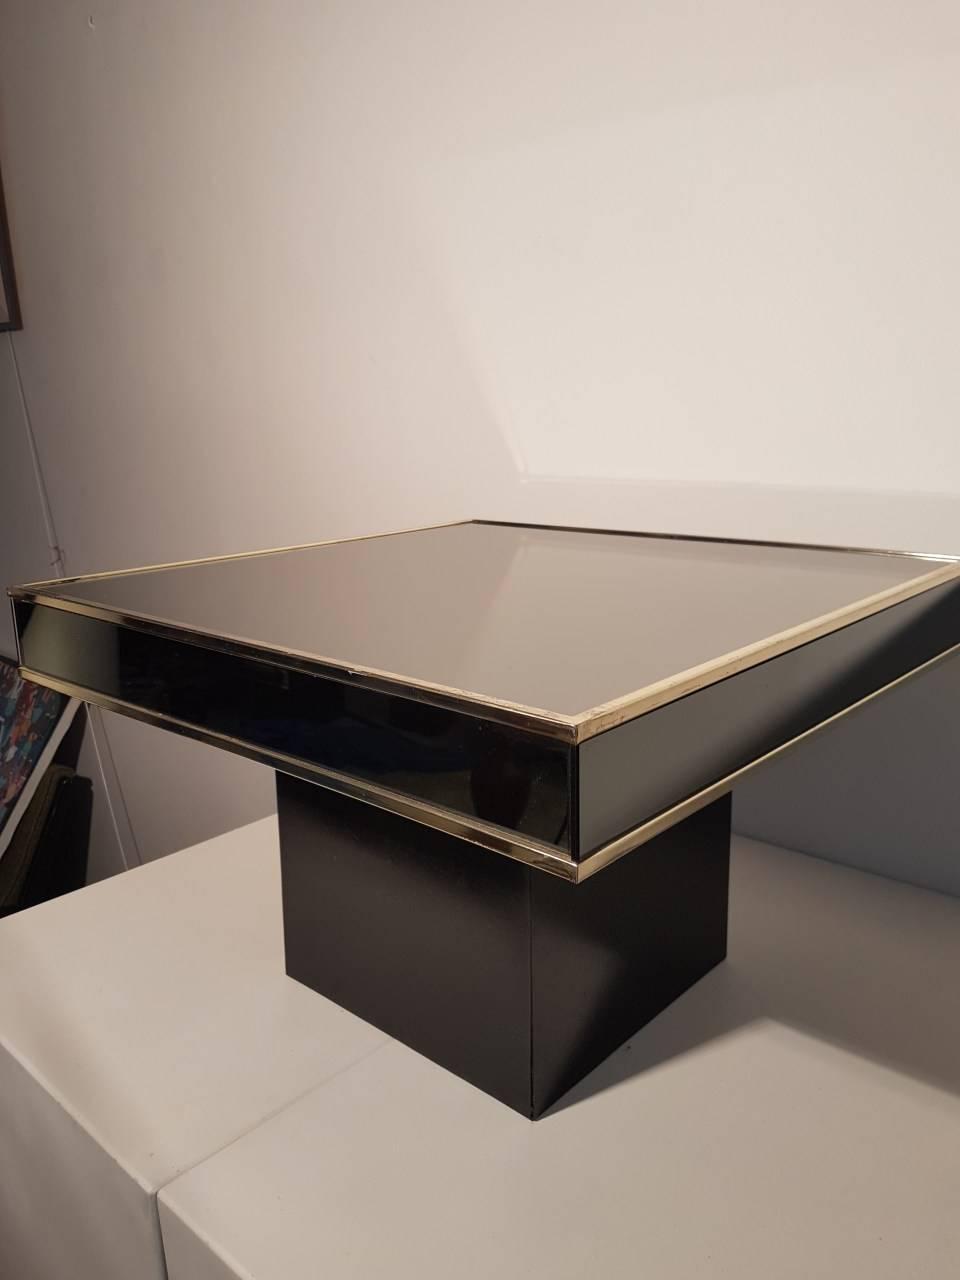 2 Tables Basses Design Willy Rizzo Benoit De Moffarts Vide